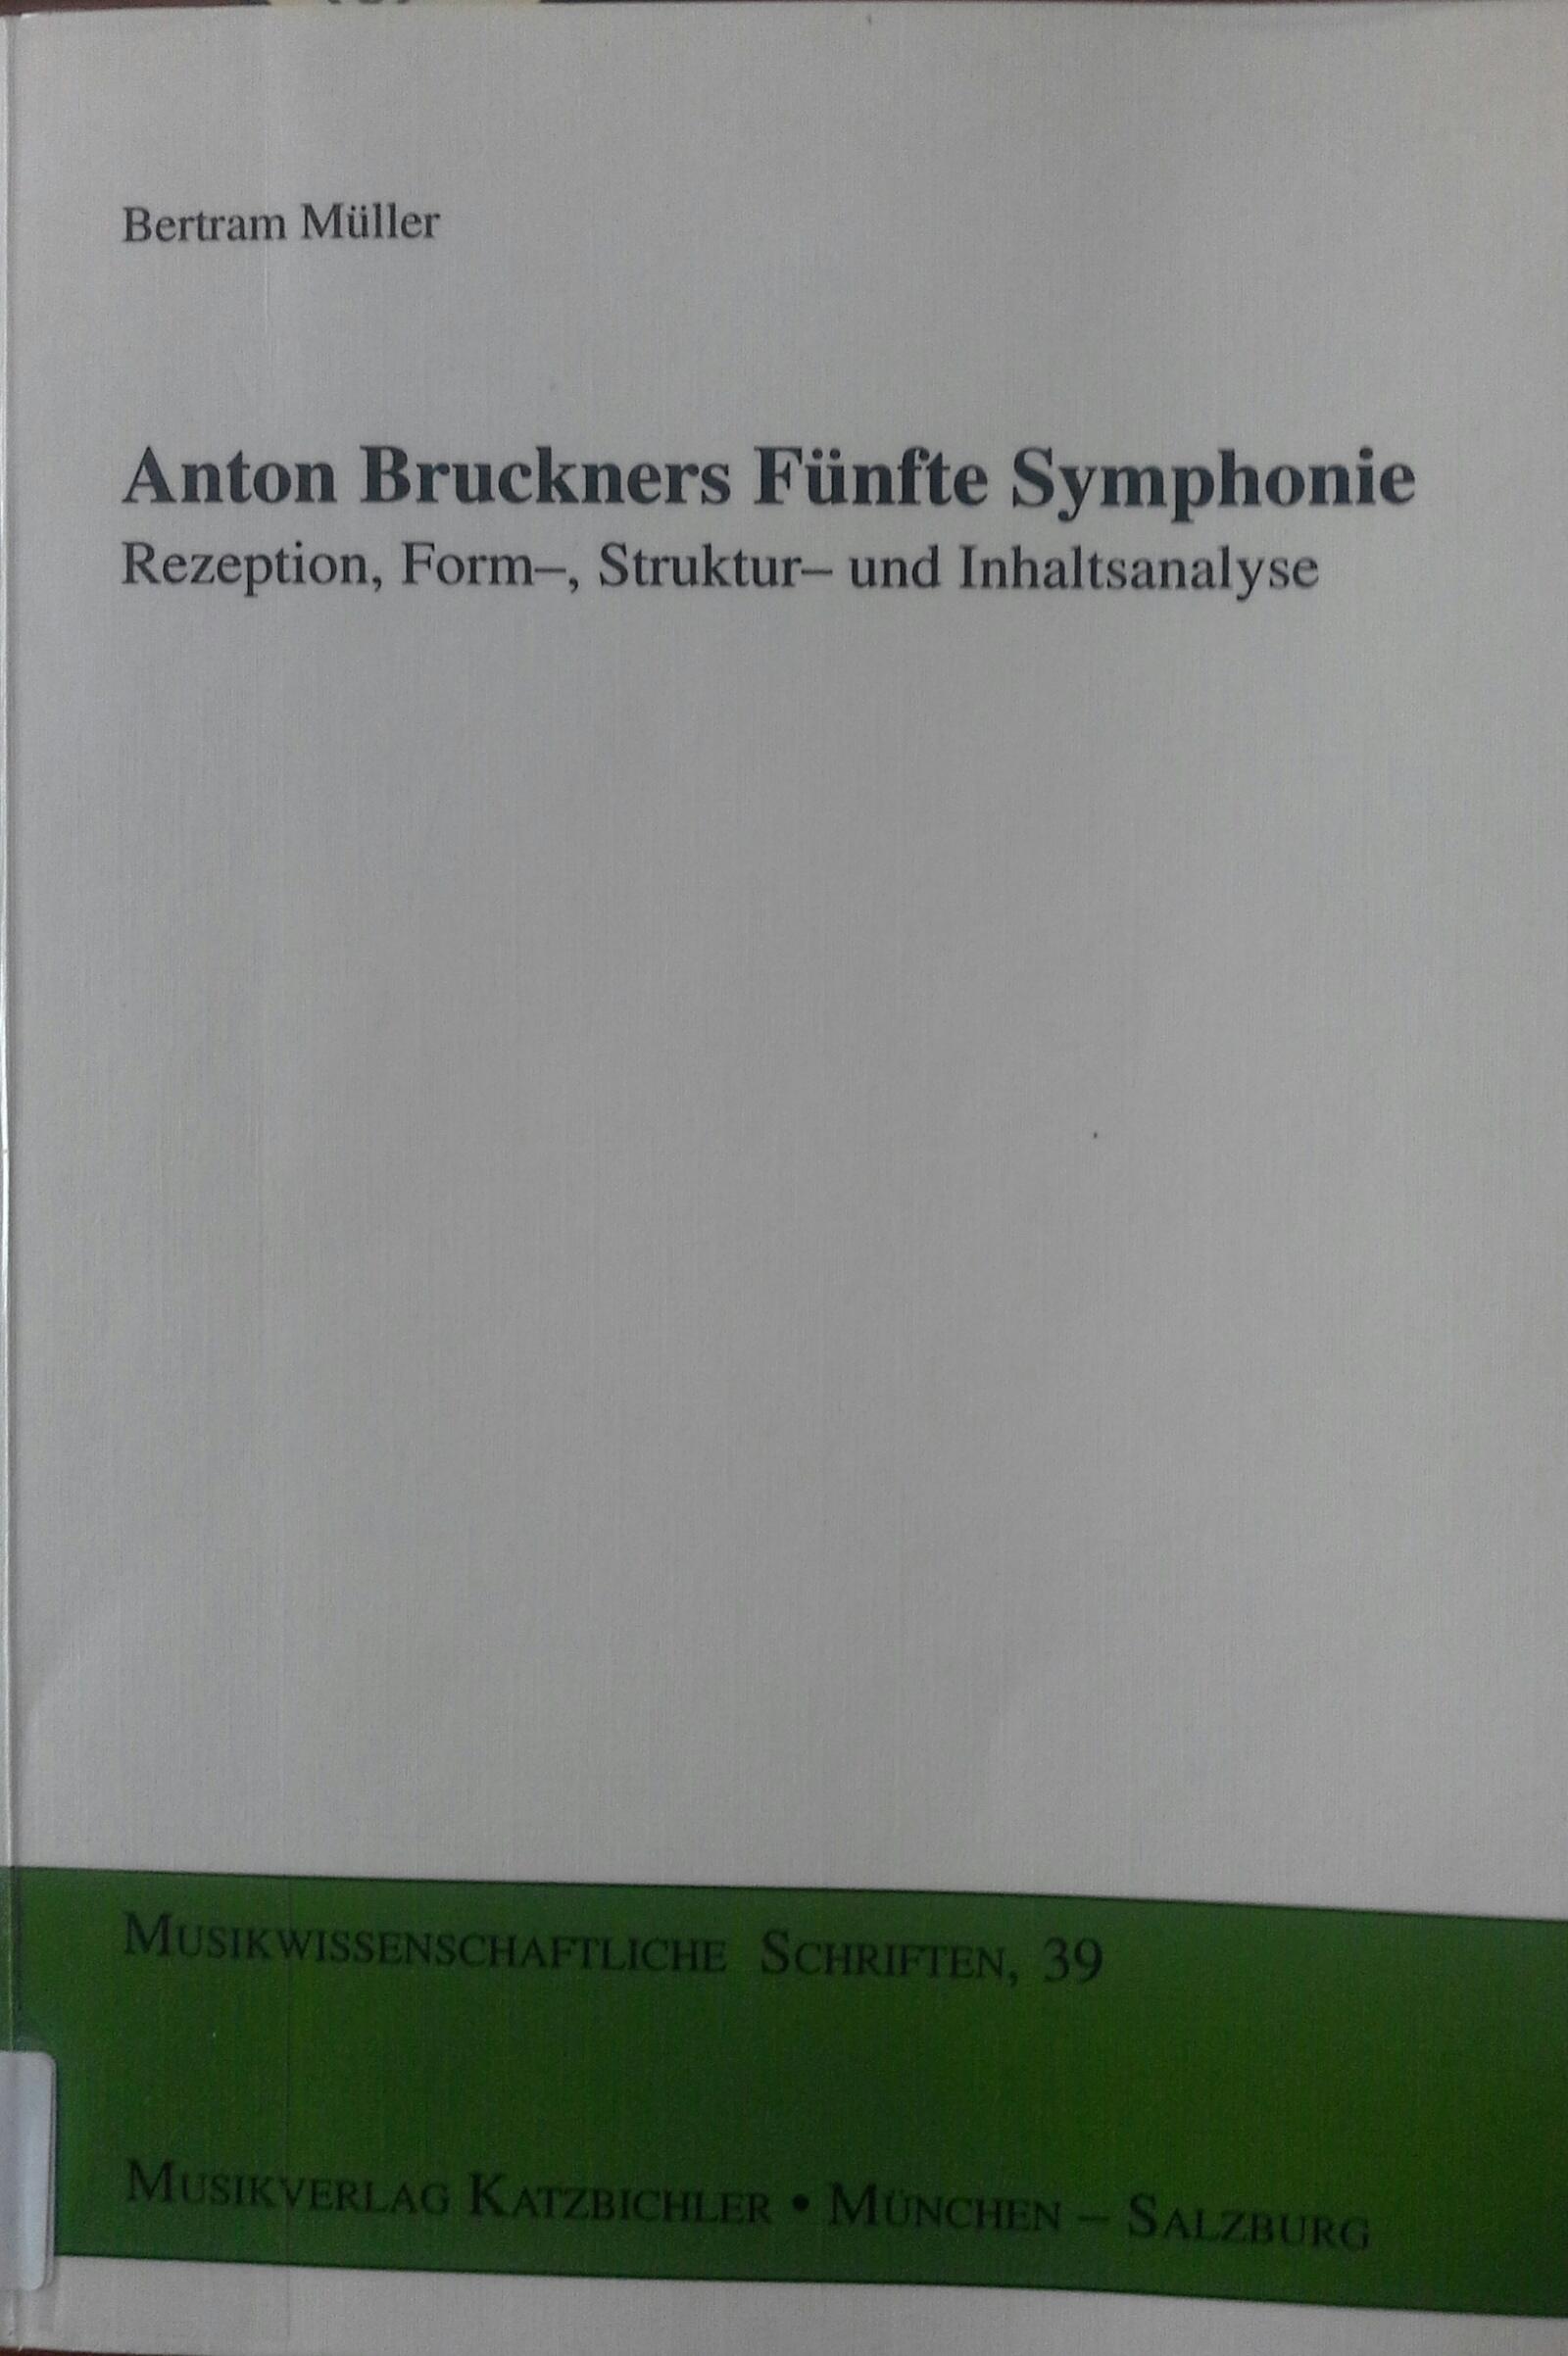 Anton Bruckners Fünfte Symphonie